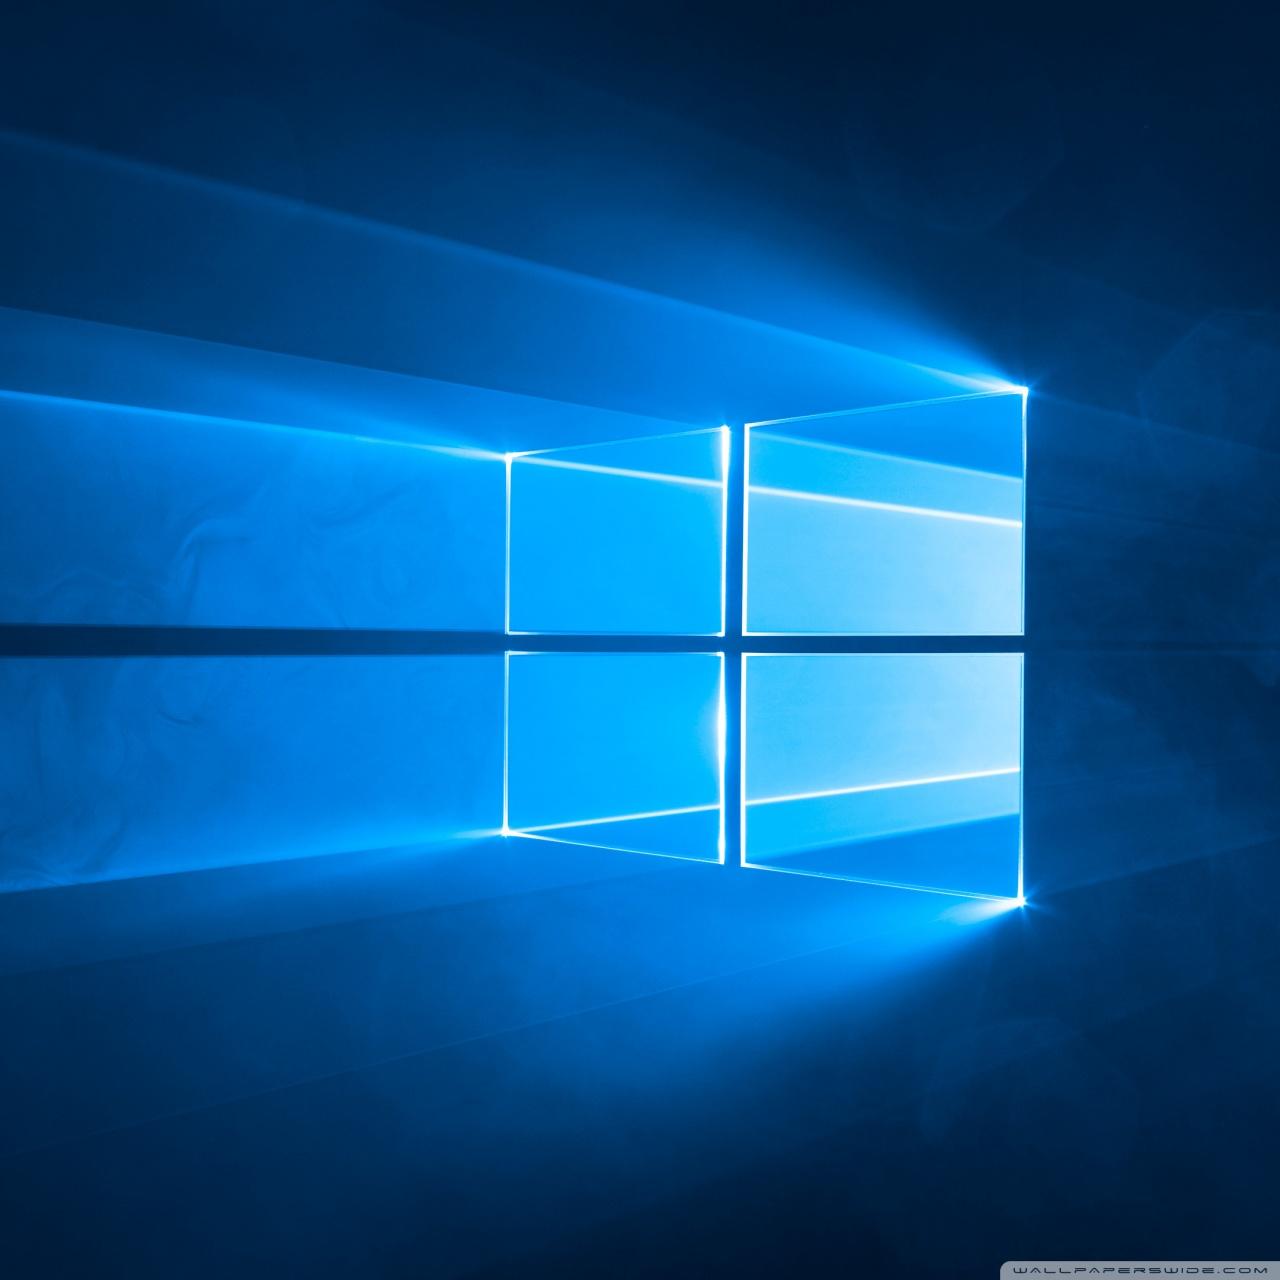 windows 10 hero 4k ❤ uhd desktop wallpaper for • widescreen